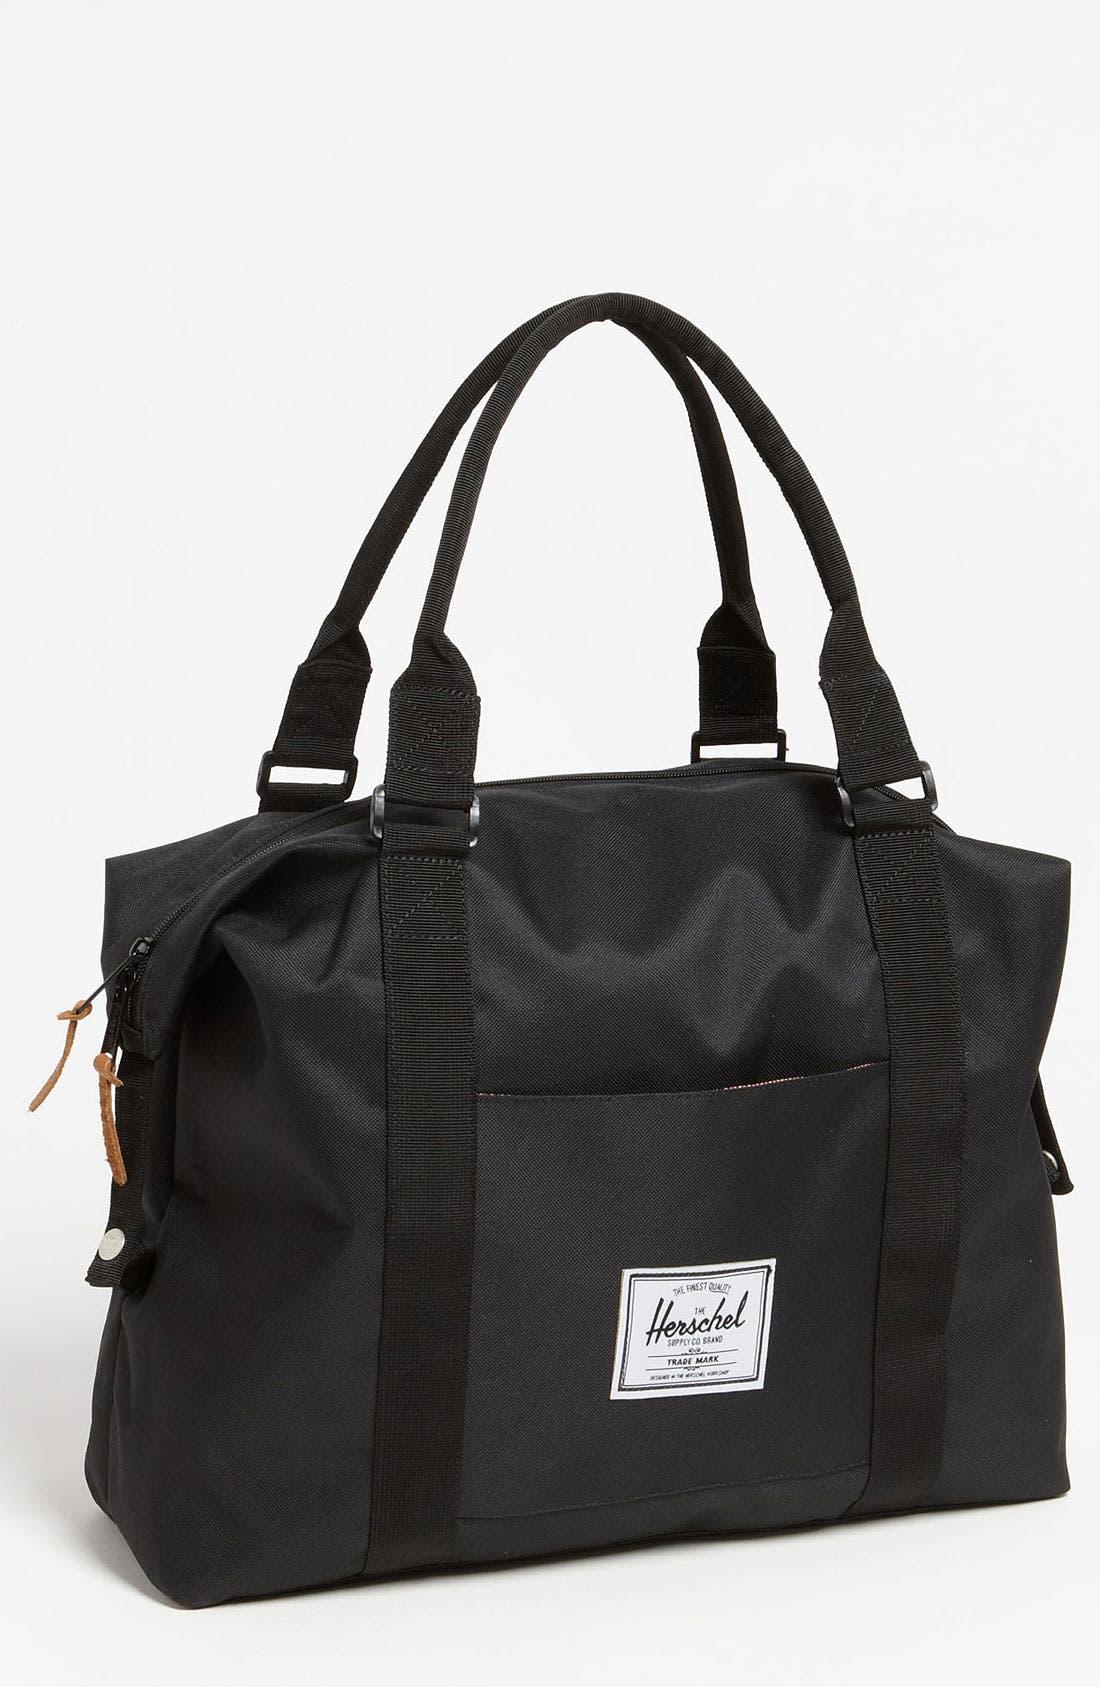 Alternate Image 1 Selected - Herschel Supply Co. 'Strand' Duffel Bag